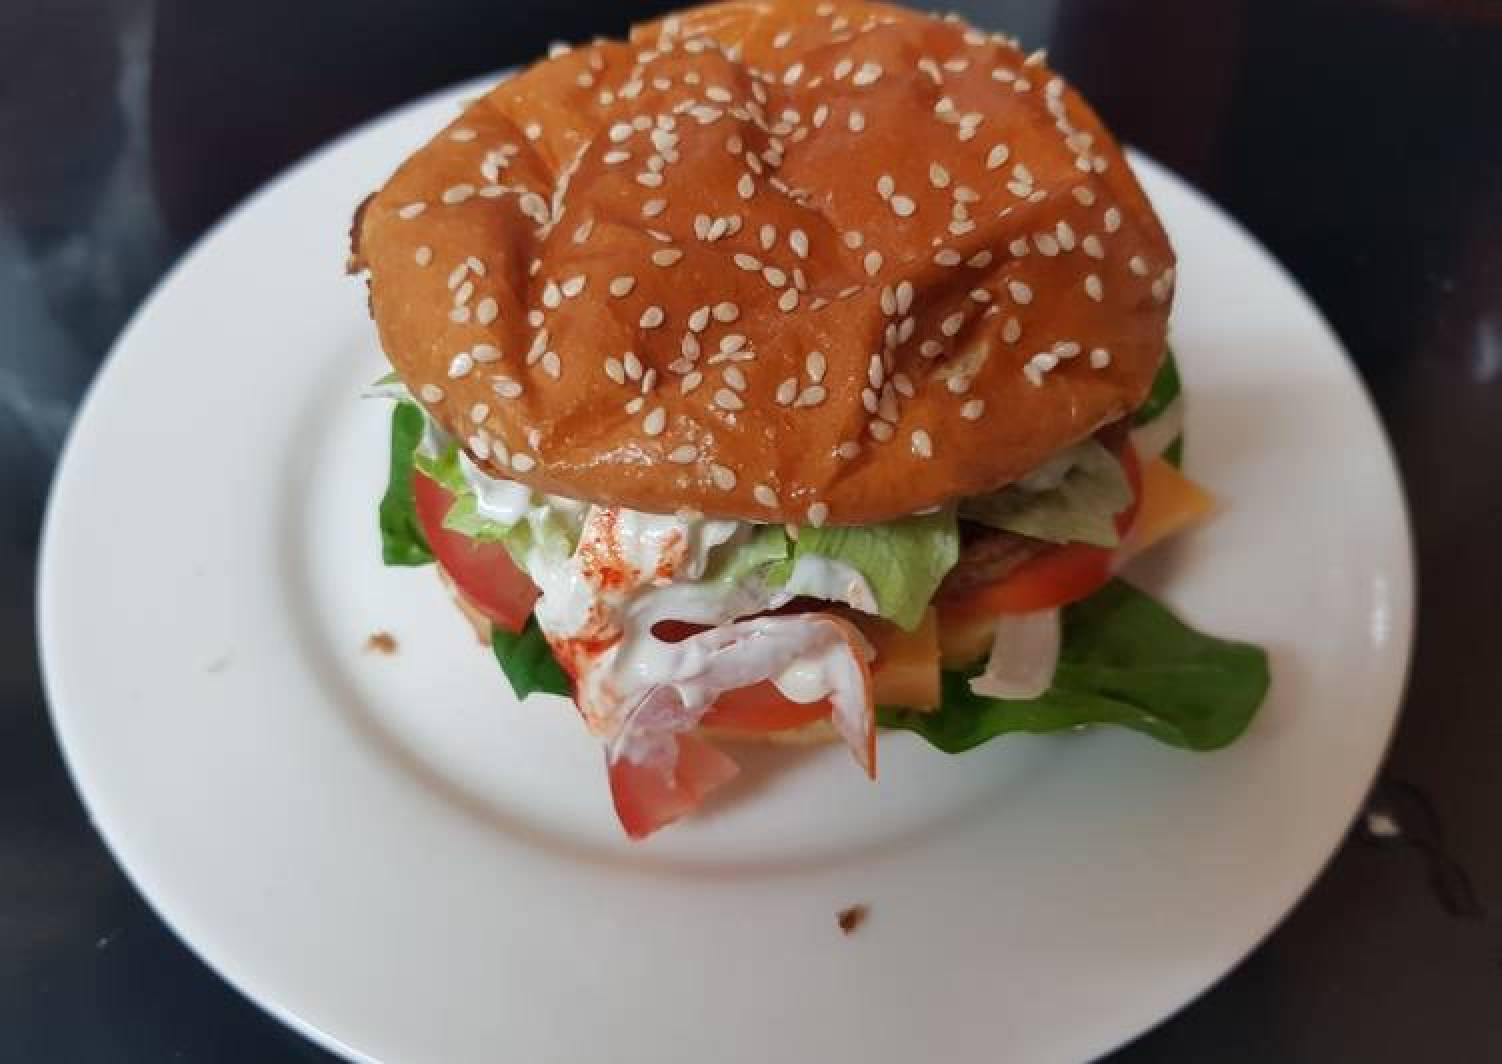 My Sriracha & Jalepeno Beef Burger 😙